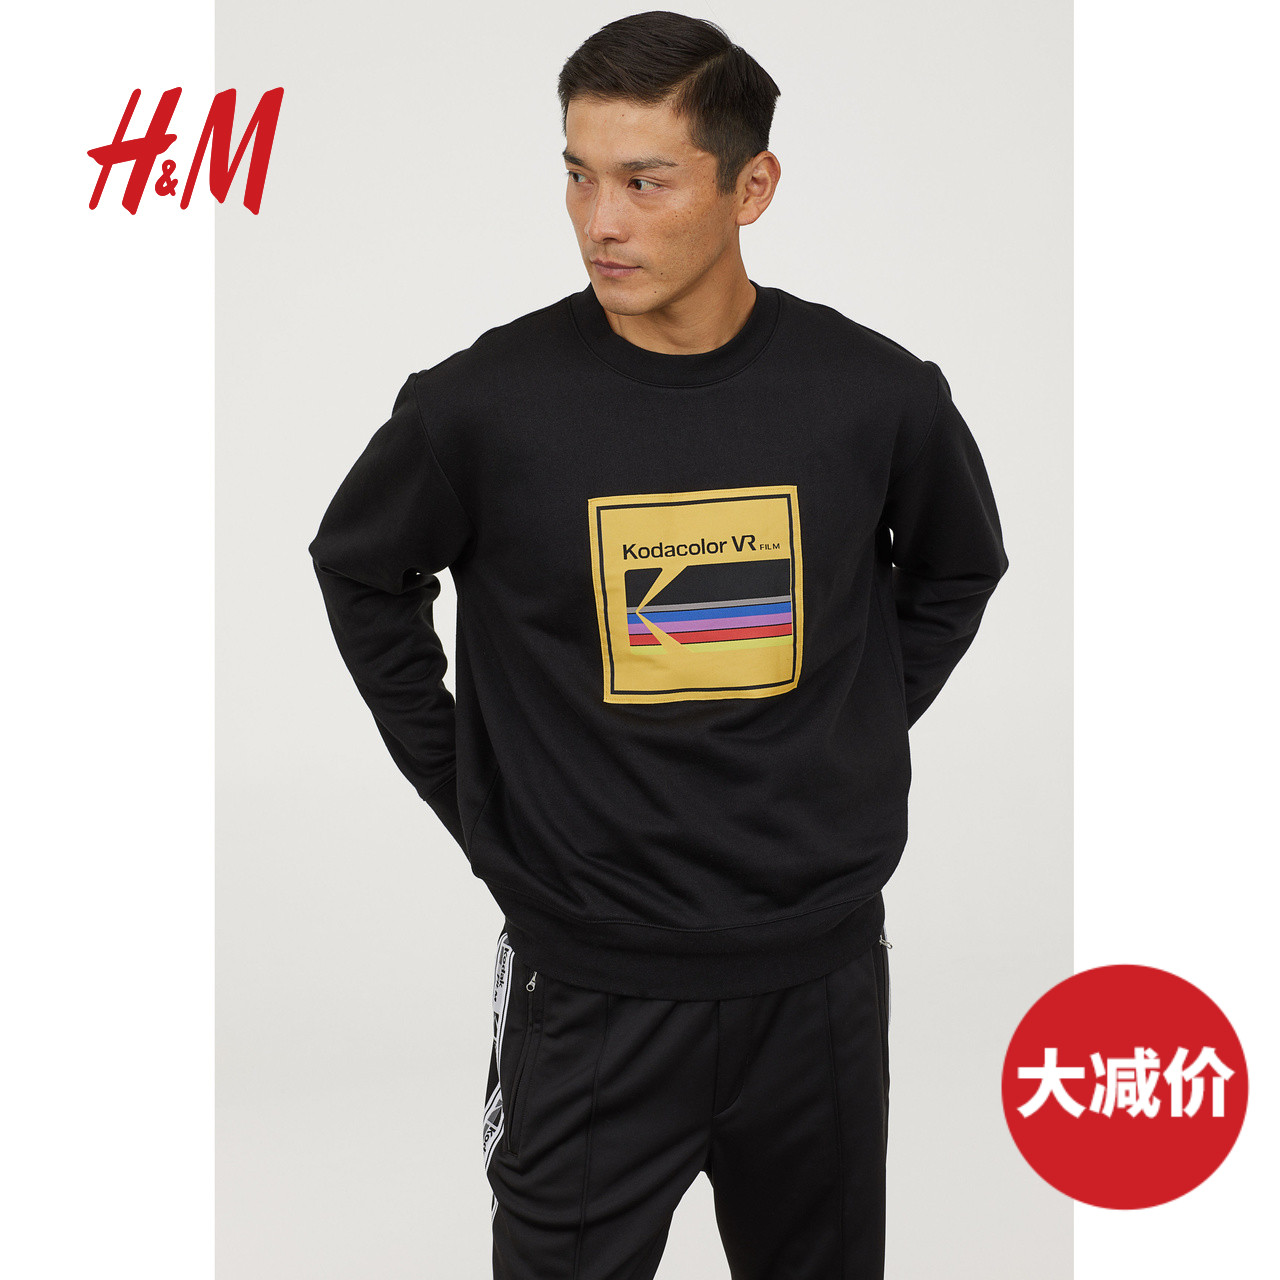 H&M Kodak 柯达合作 HM0697548 男士涤棉卫衣